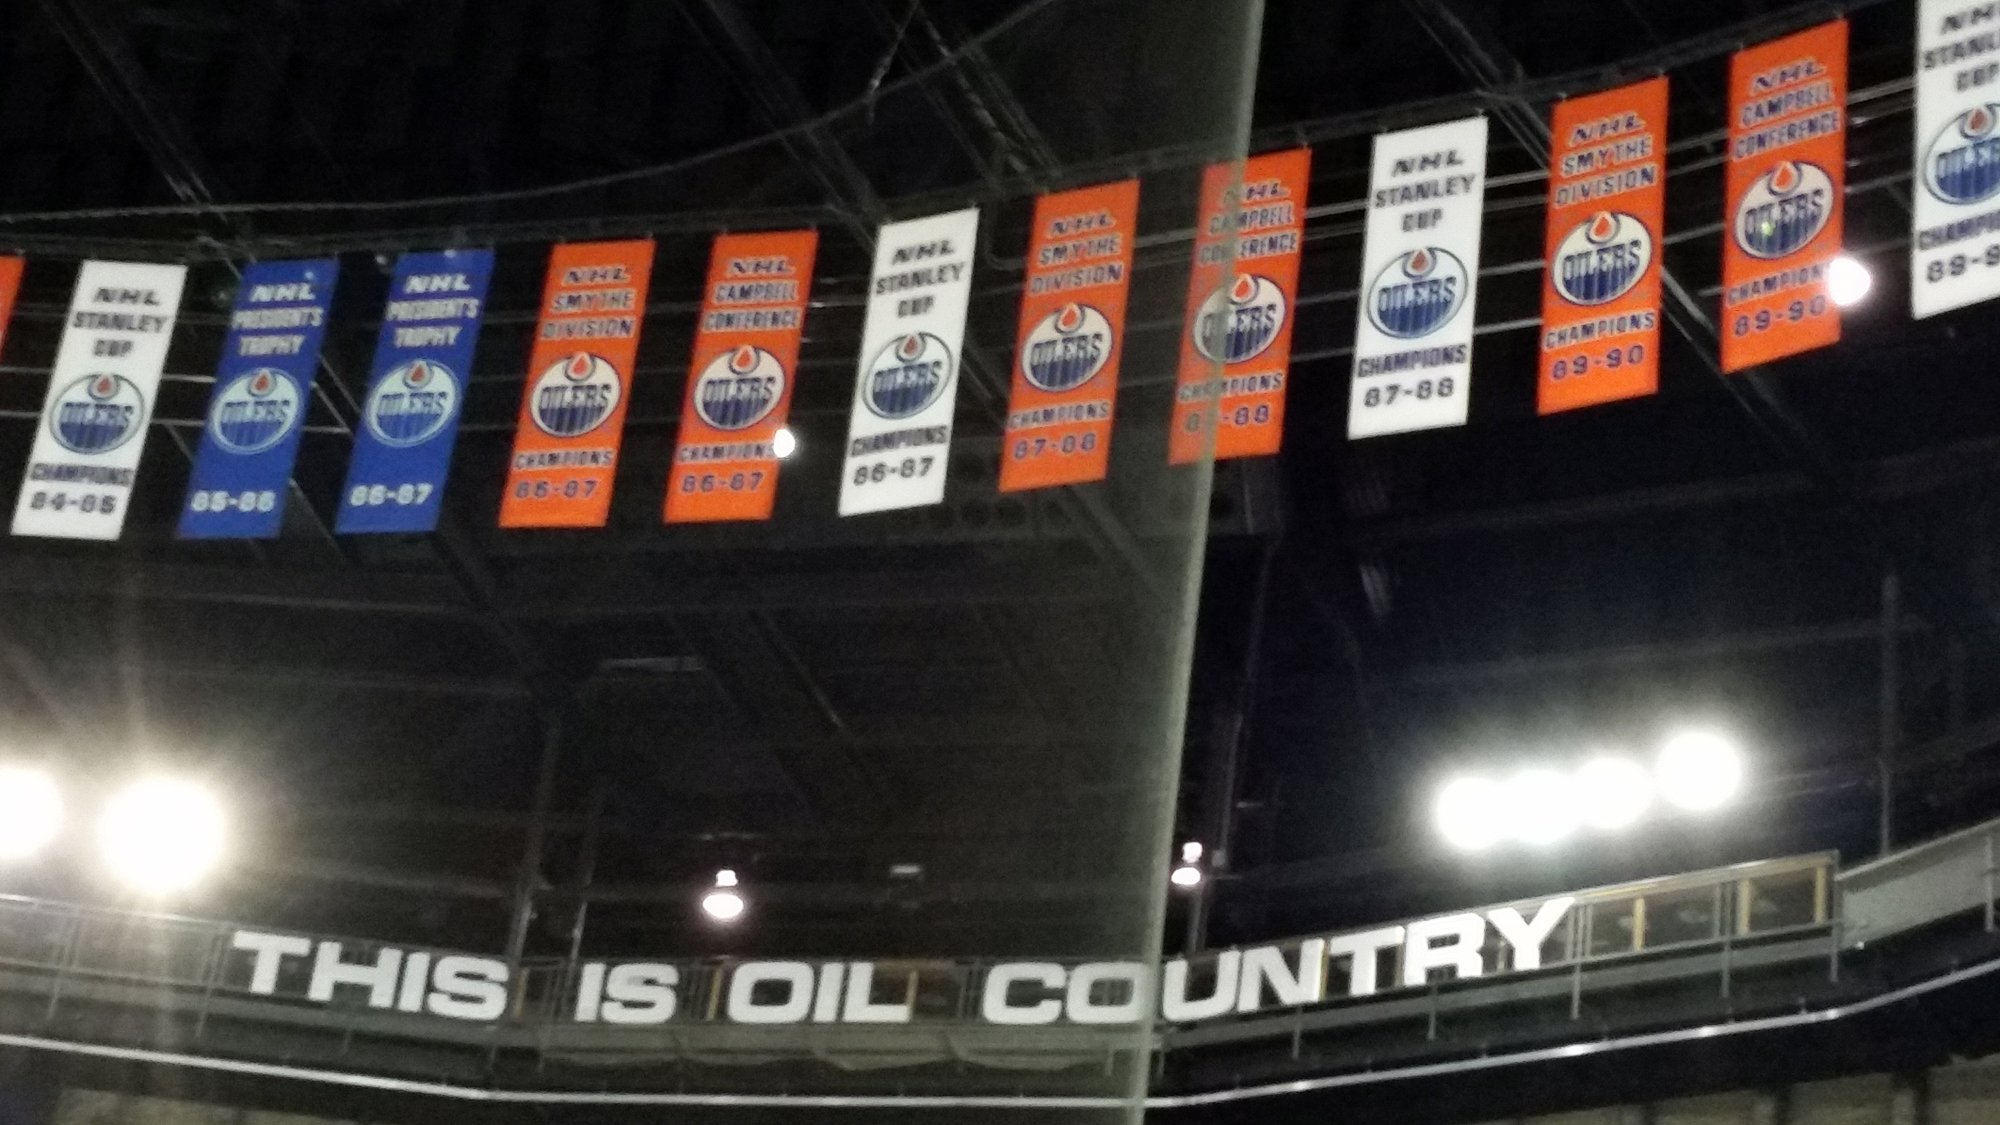 oilers-championship-banners-edmonton